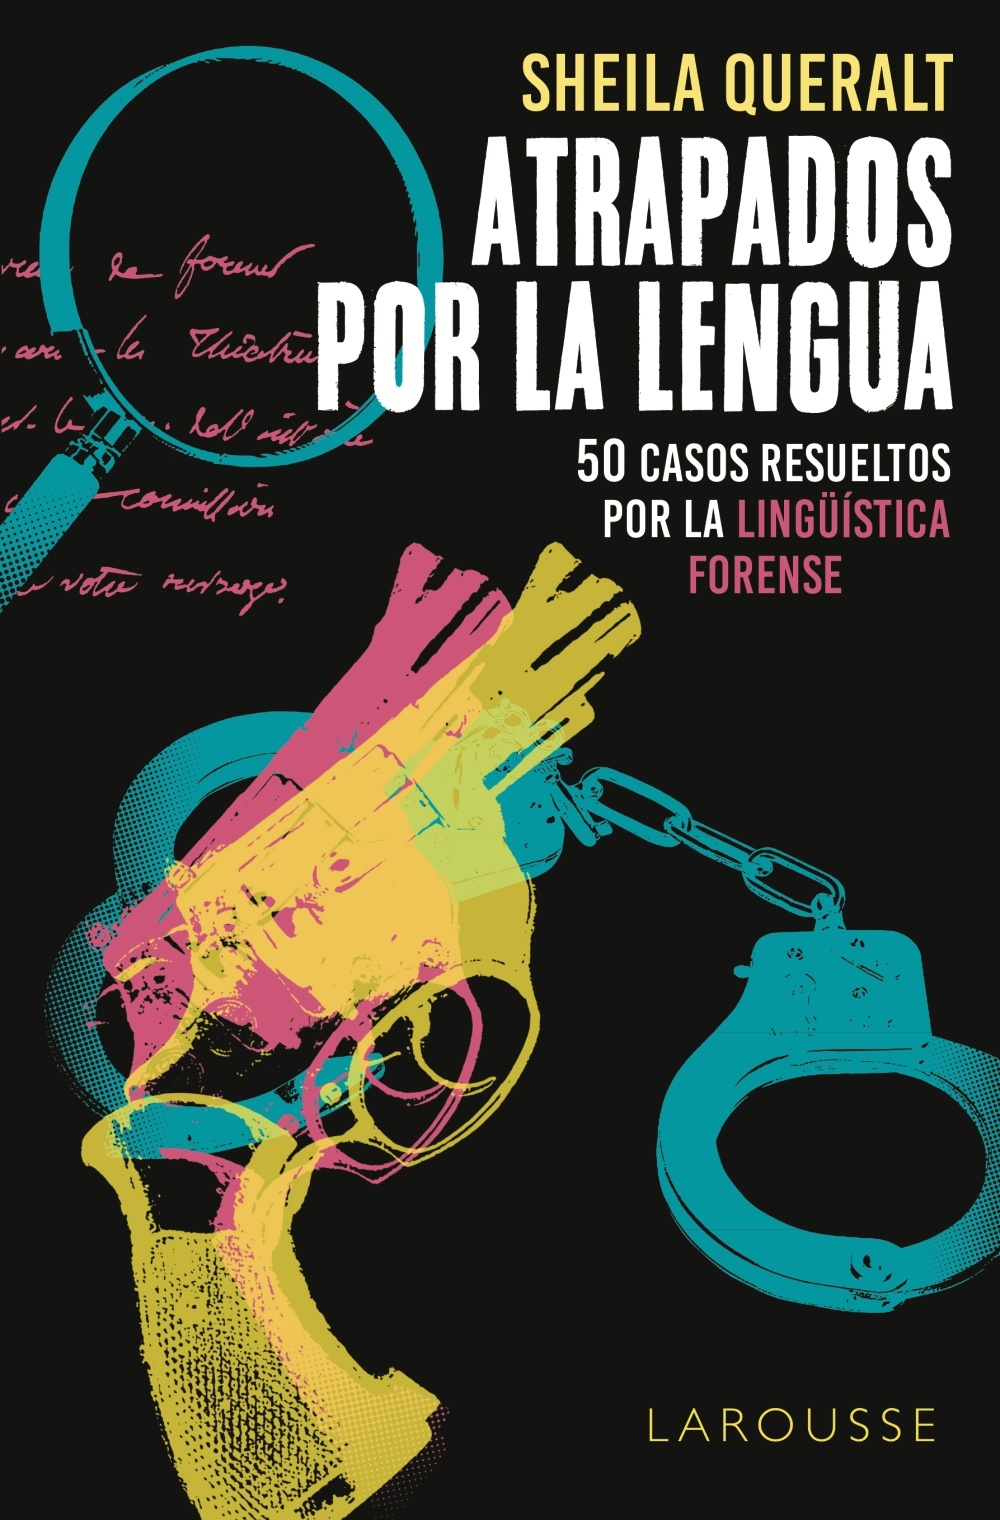 Libro recomendado: 'Atrapados por la lengua' de Sheila Queralt